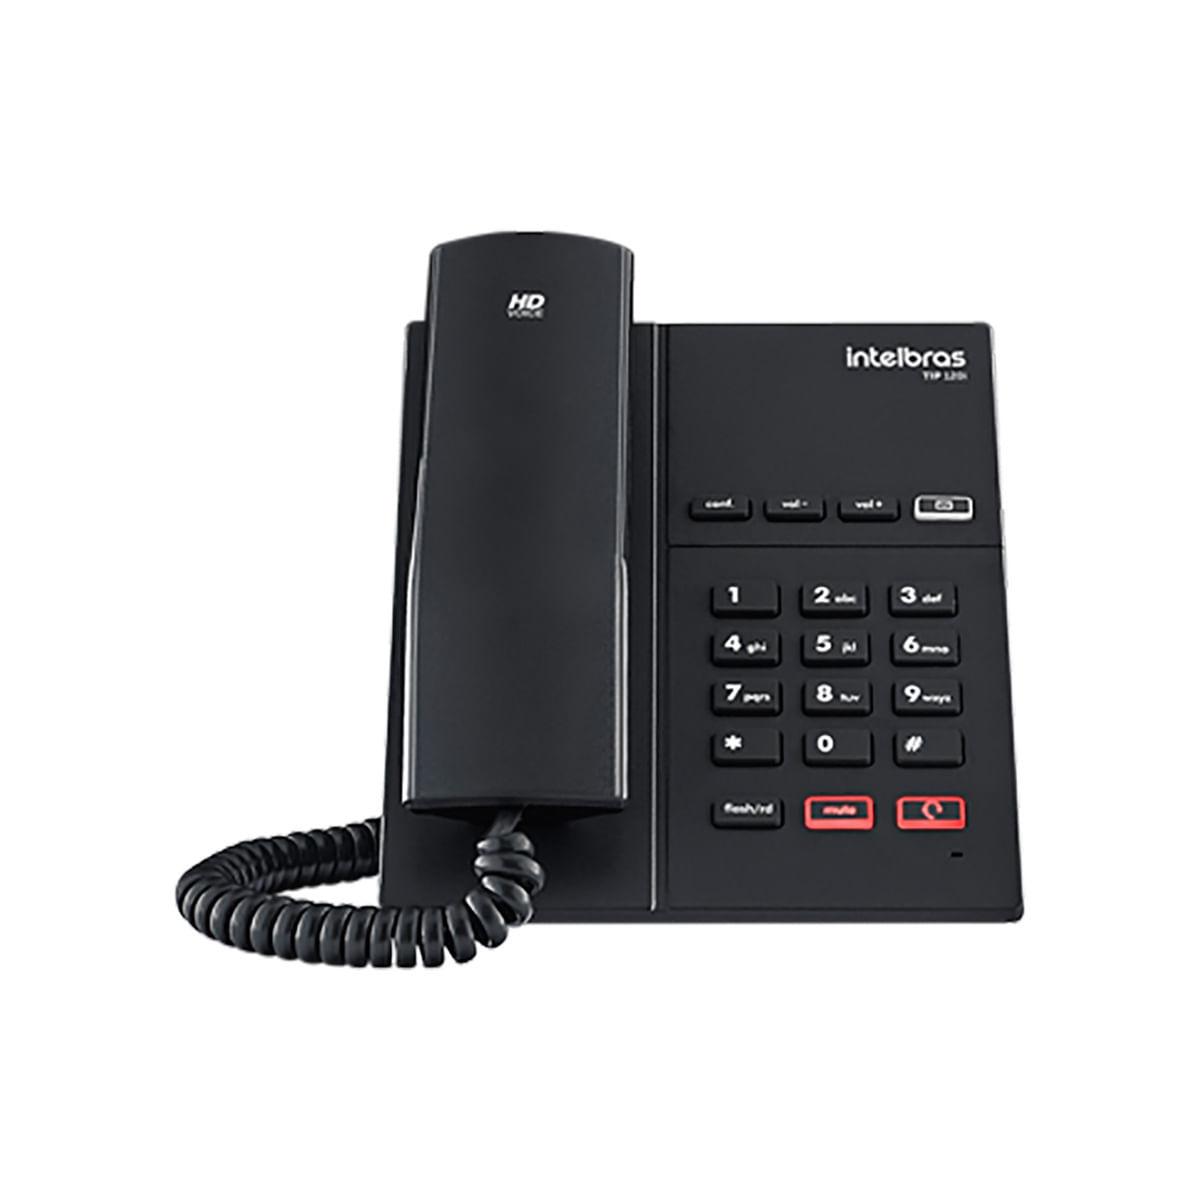 Telefone IP Intelbras  TIP 120i c/ Embalagem colorida